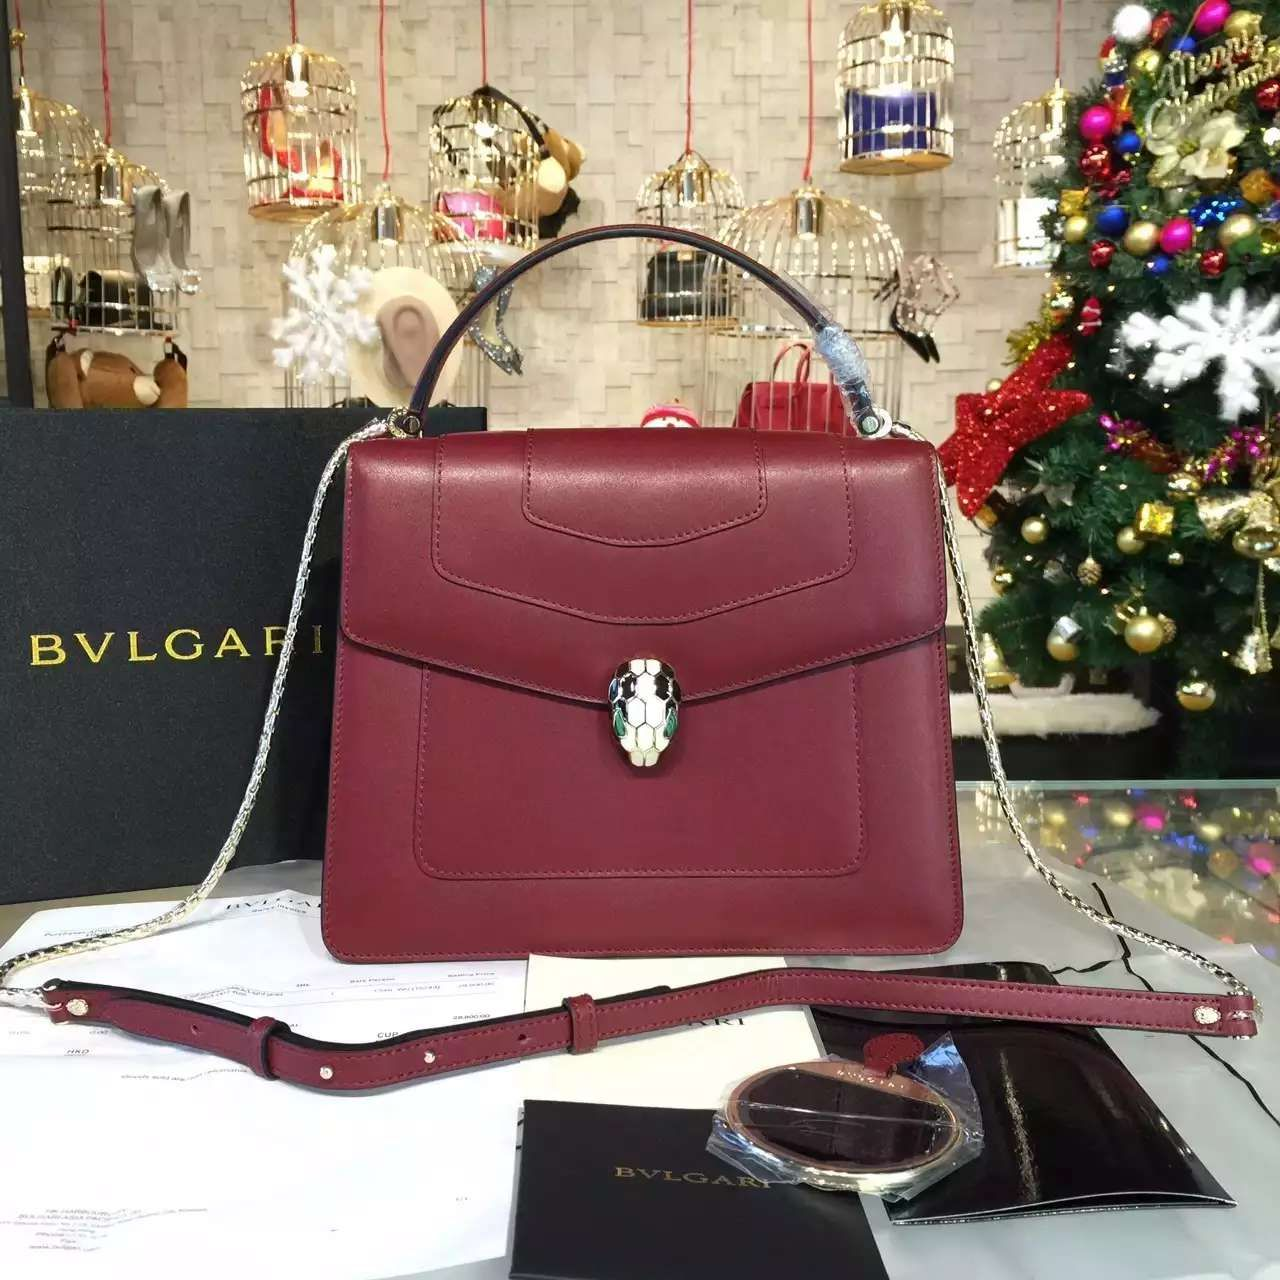 bvlgari Bag ID  52601FORSALEayybagscom